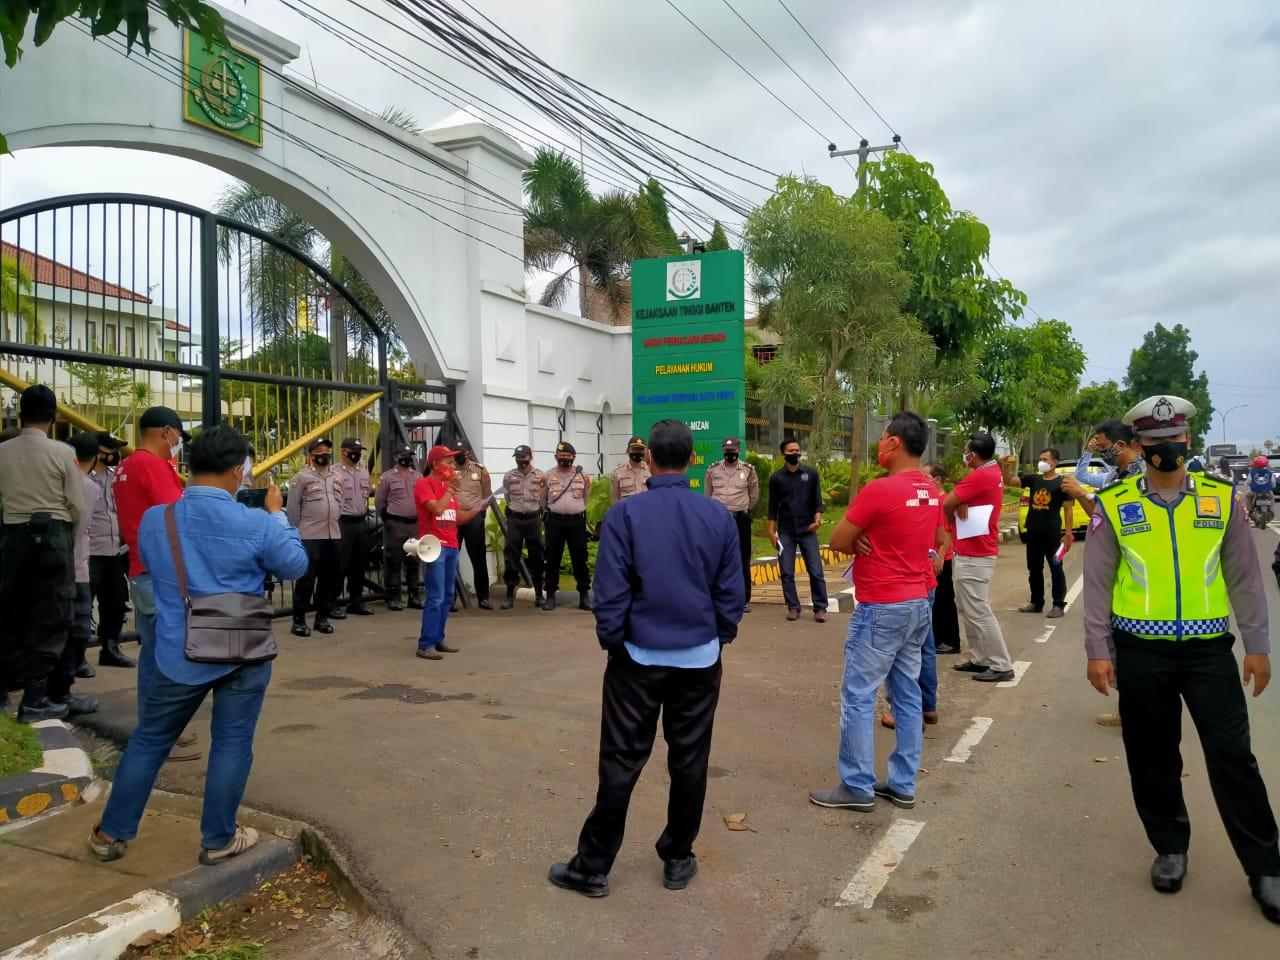 Gambar Aksi Unras Pesidium NGO Banten, Polres Serang Kota Siagakan Ratusan Personel 11